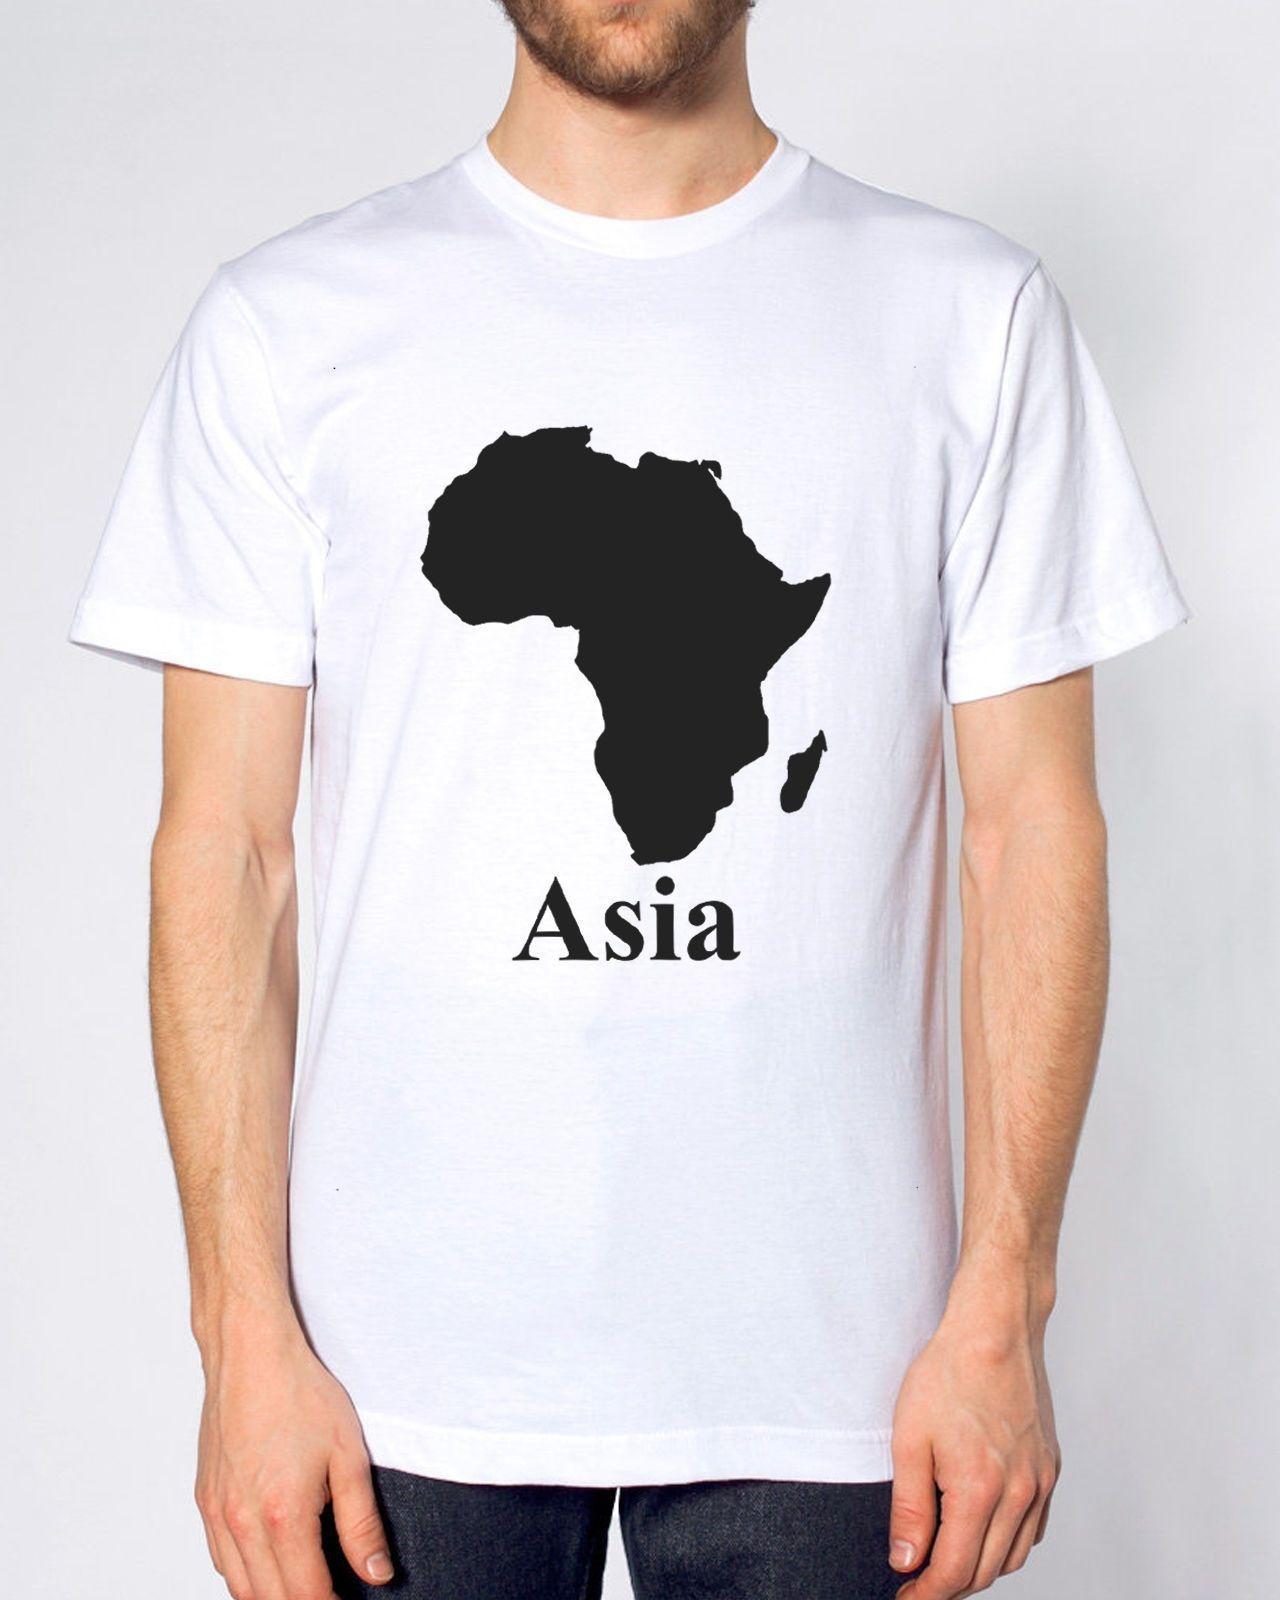 9792f98c9 Compre África Asia Camiseta Divertida Parodia Mapa Hombres Mujeres Niños  Fresco Casual Orgullo Camiseta Hombres Unisex Nueva Moda Camiseta Divertida  Tops A ...